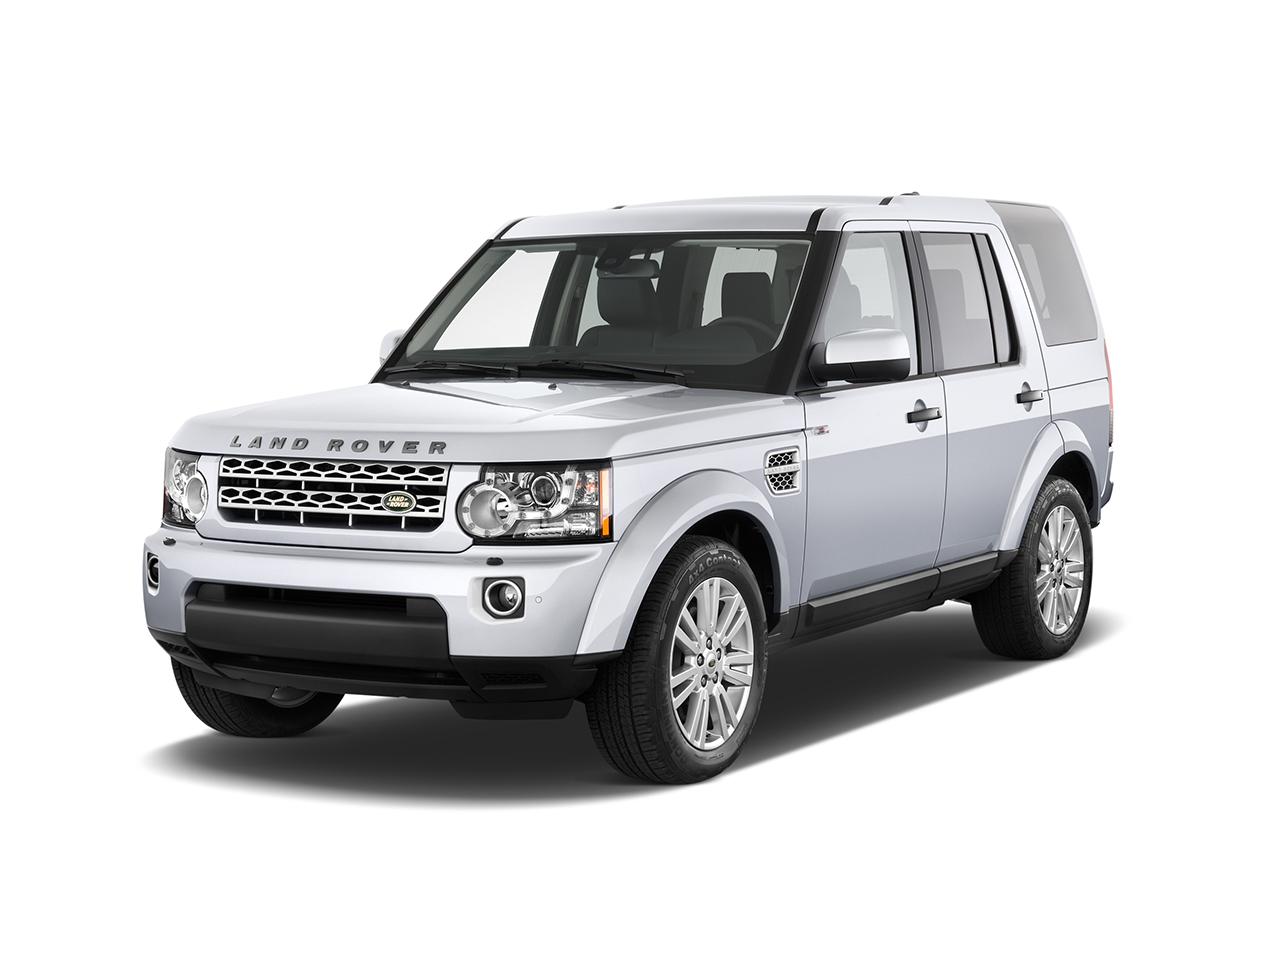 Land Rover Lr4 2018 Saudi Arabia